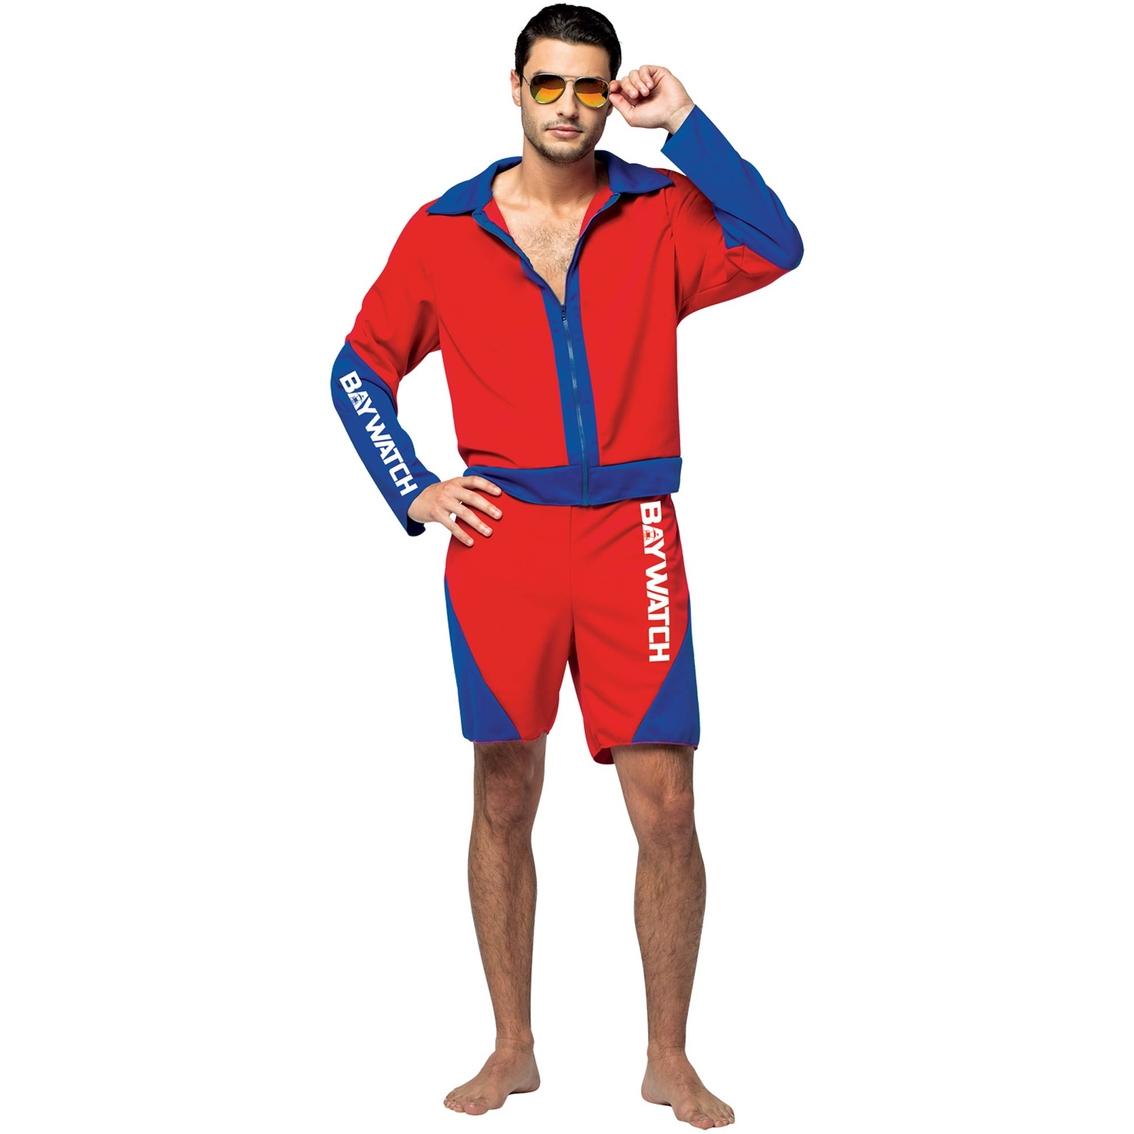 4e9af27ed143 Rasta Imposta Men's Baywatch Male Lifeguard Suit Costume | Men's ...